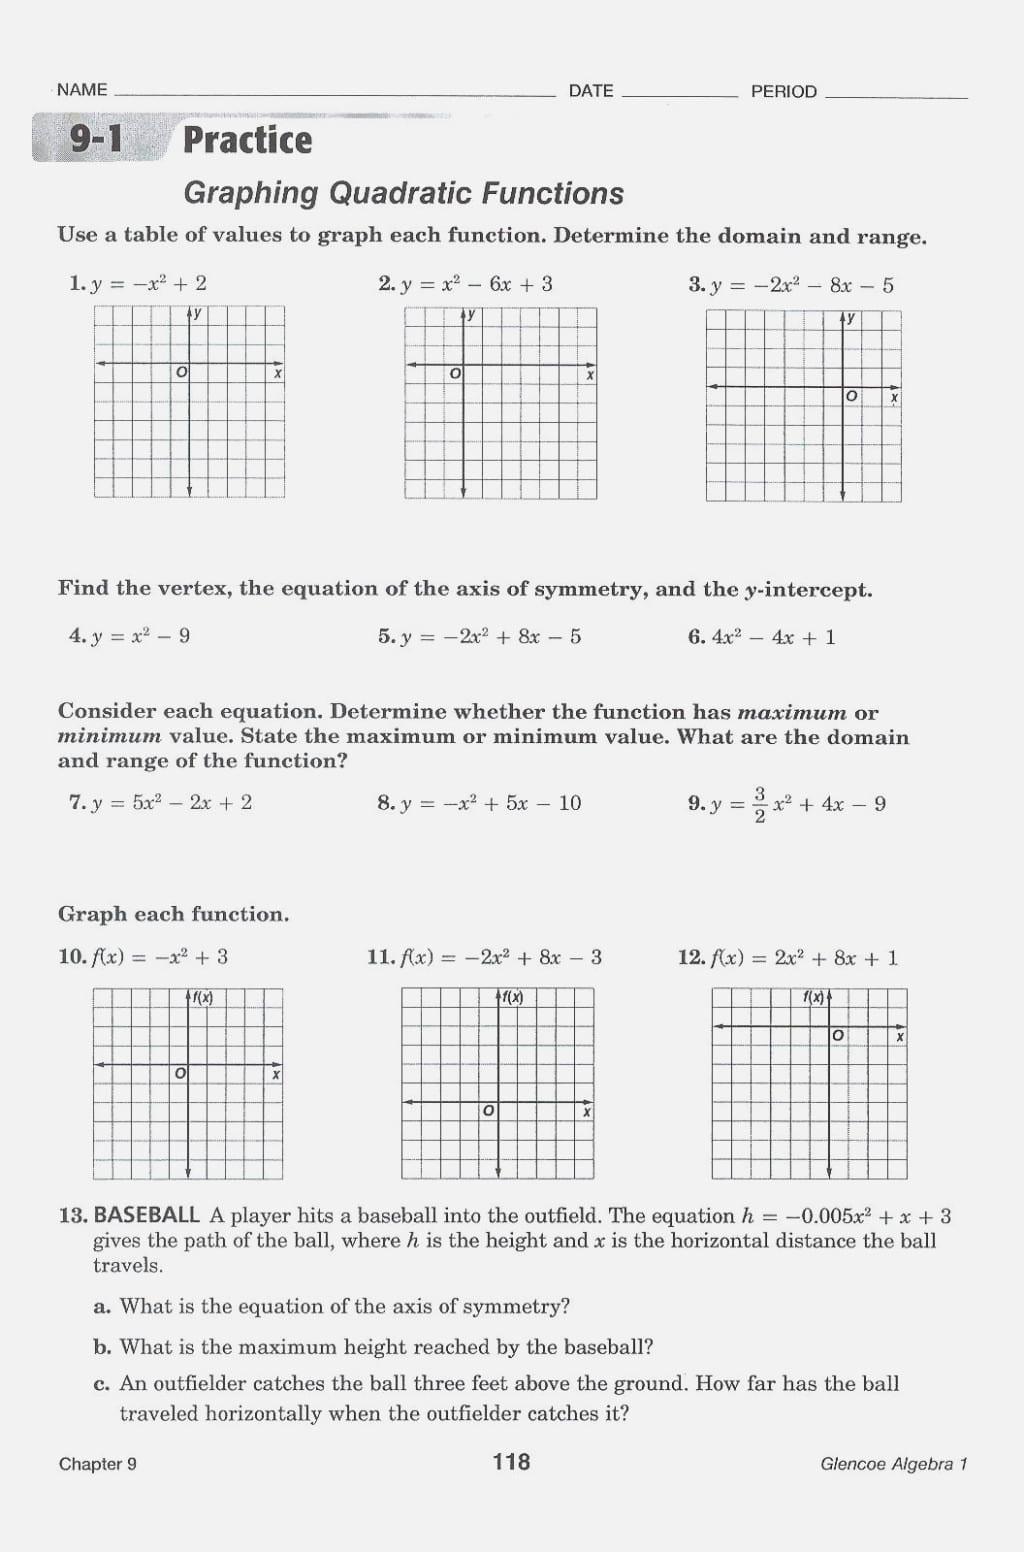 Practice Worksheet Graphing Quadratic Functions In